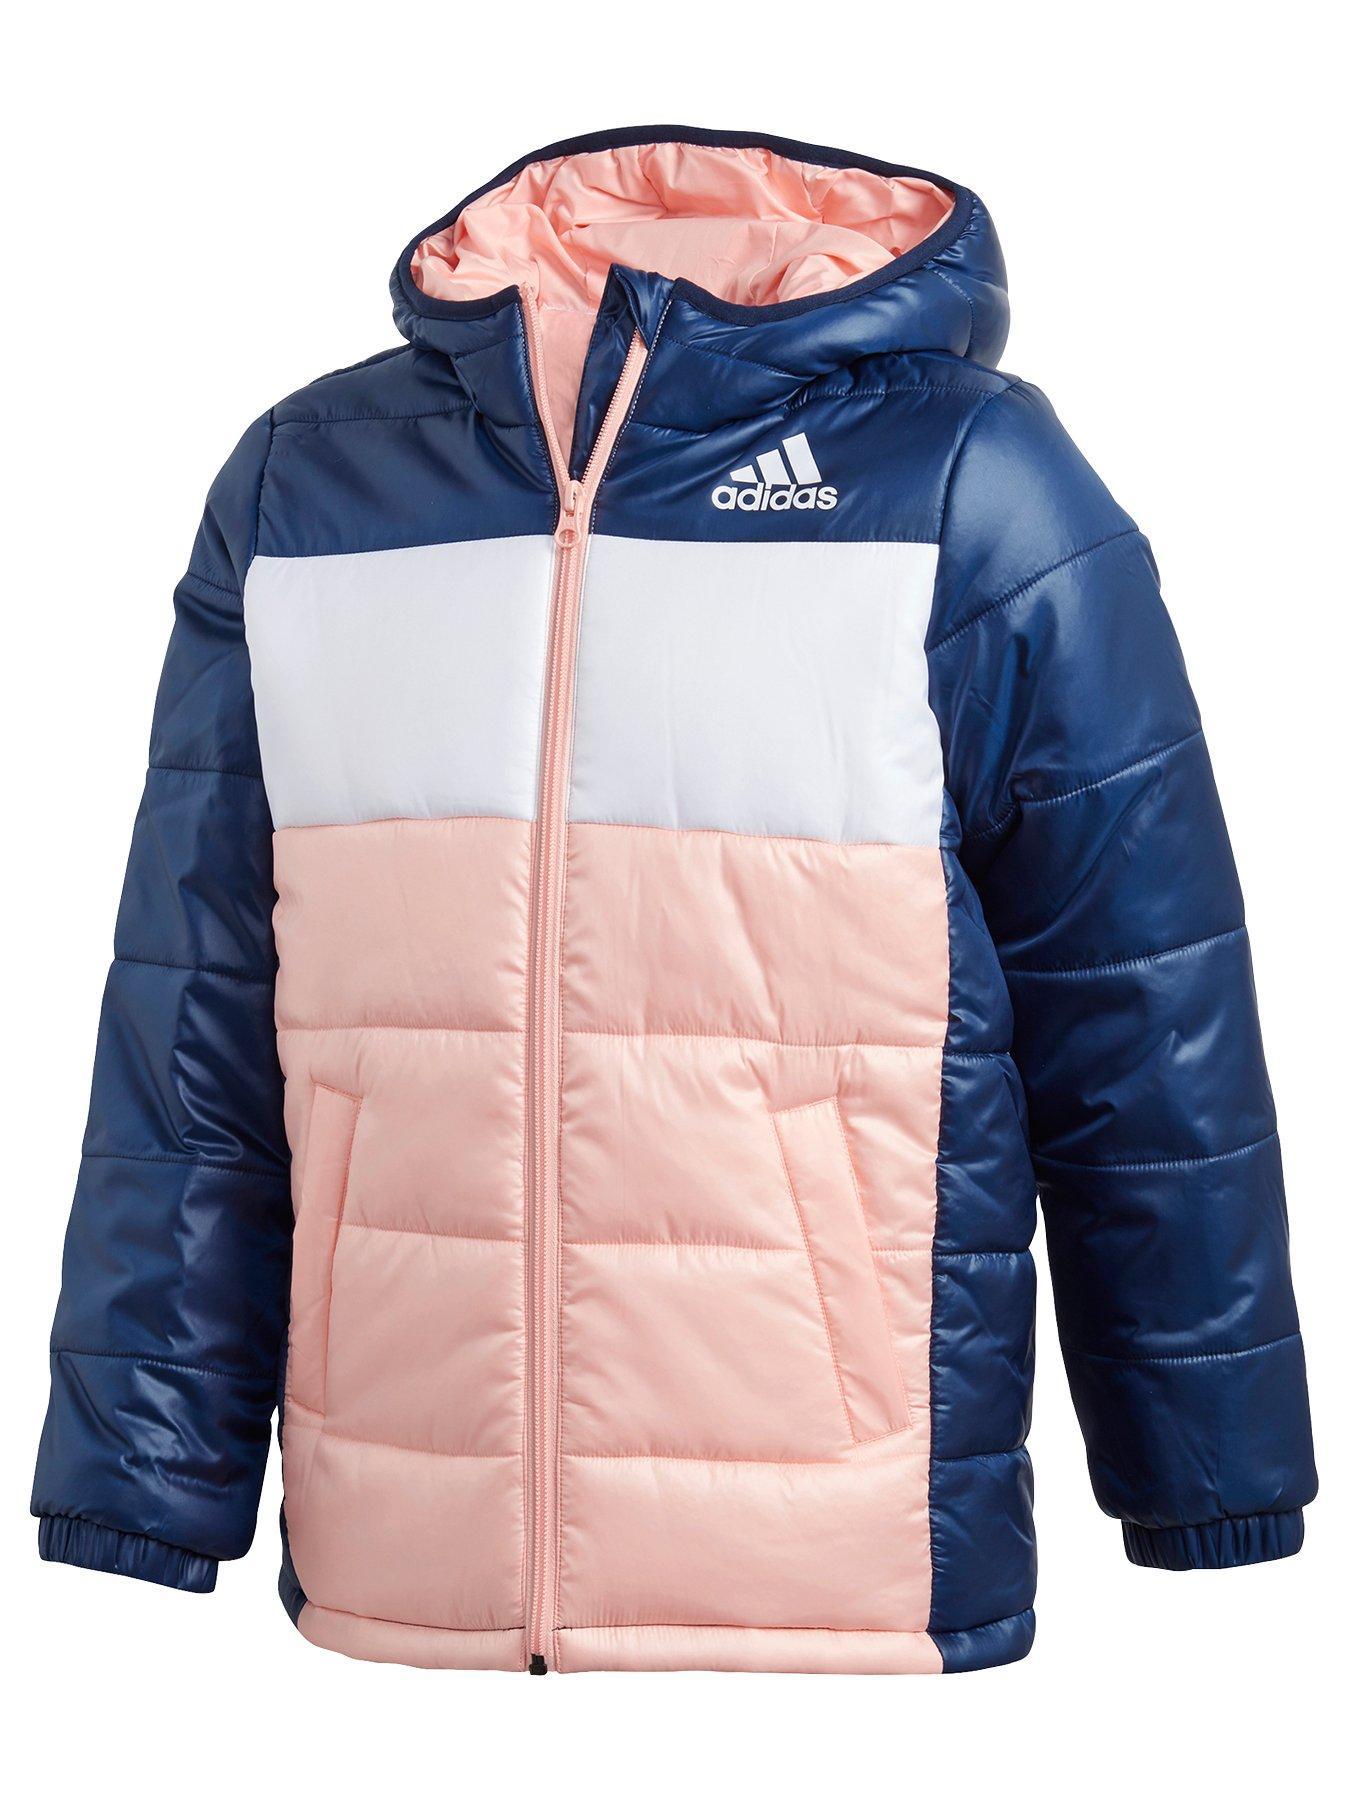 Kids Adidas Sportswear | Girls & Boys | Littlewoods Ireland